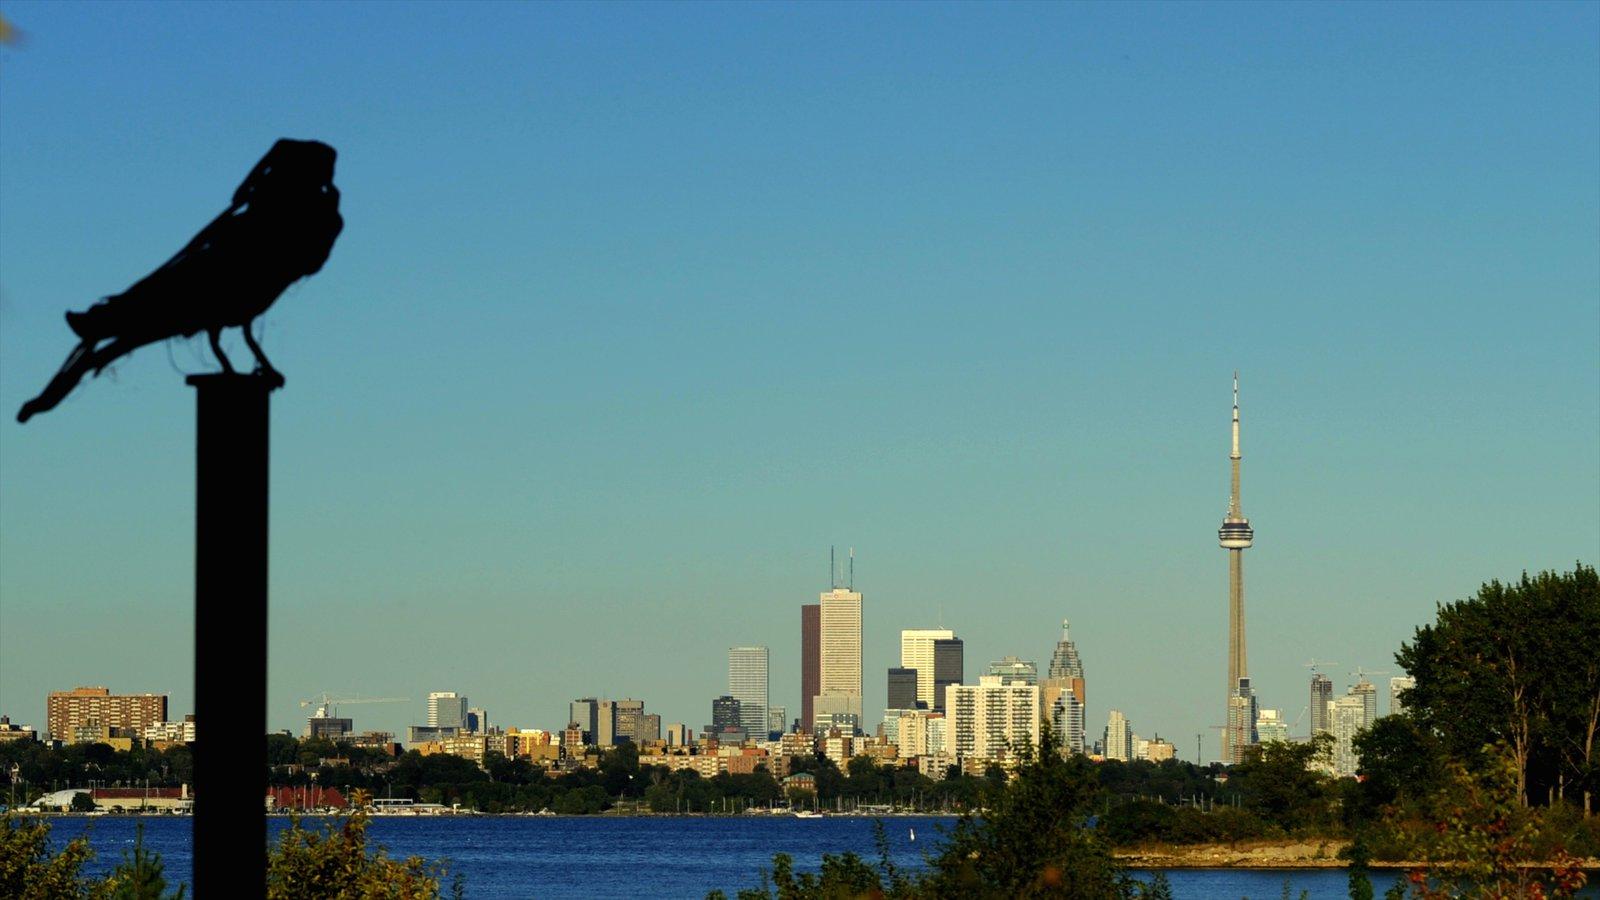 Centre Island which includes city views, a skyscraper and bird life